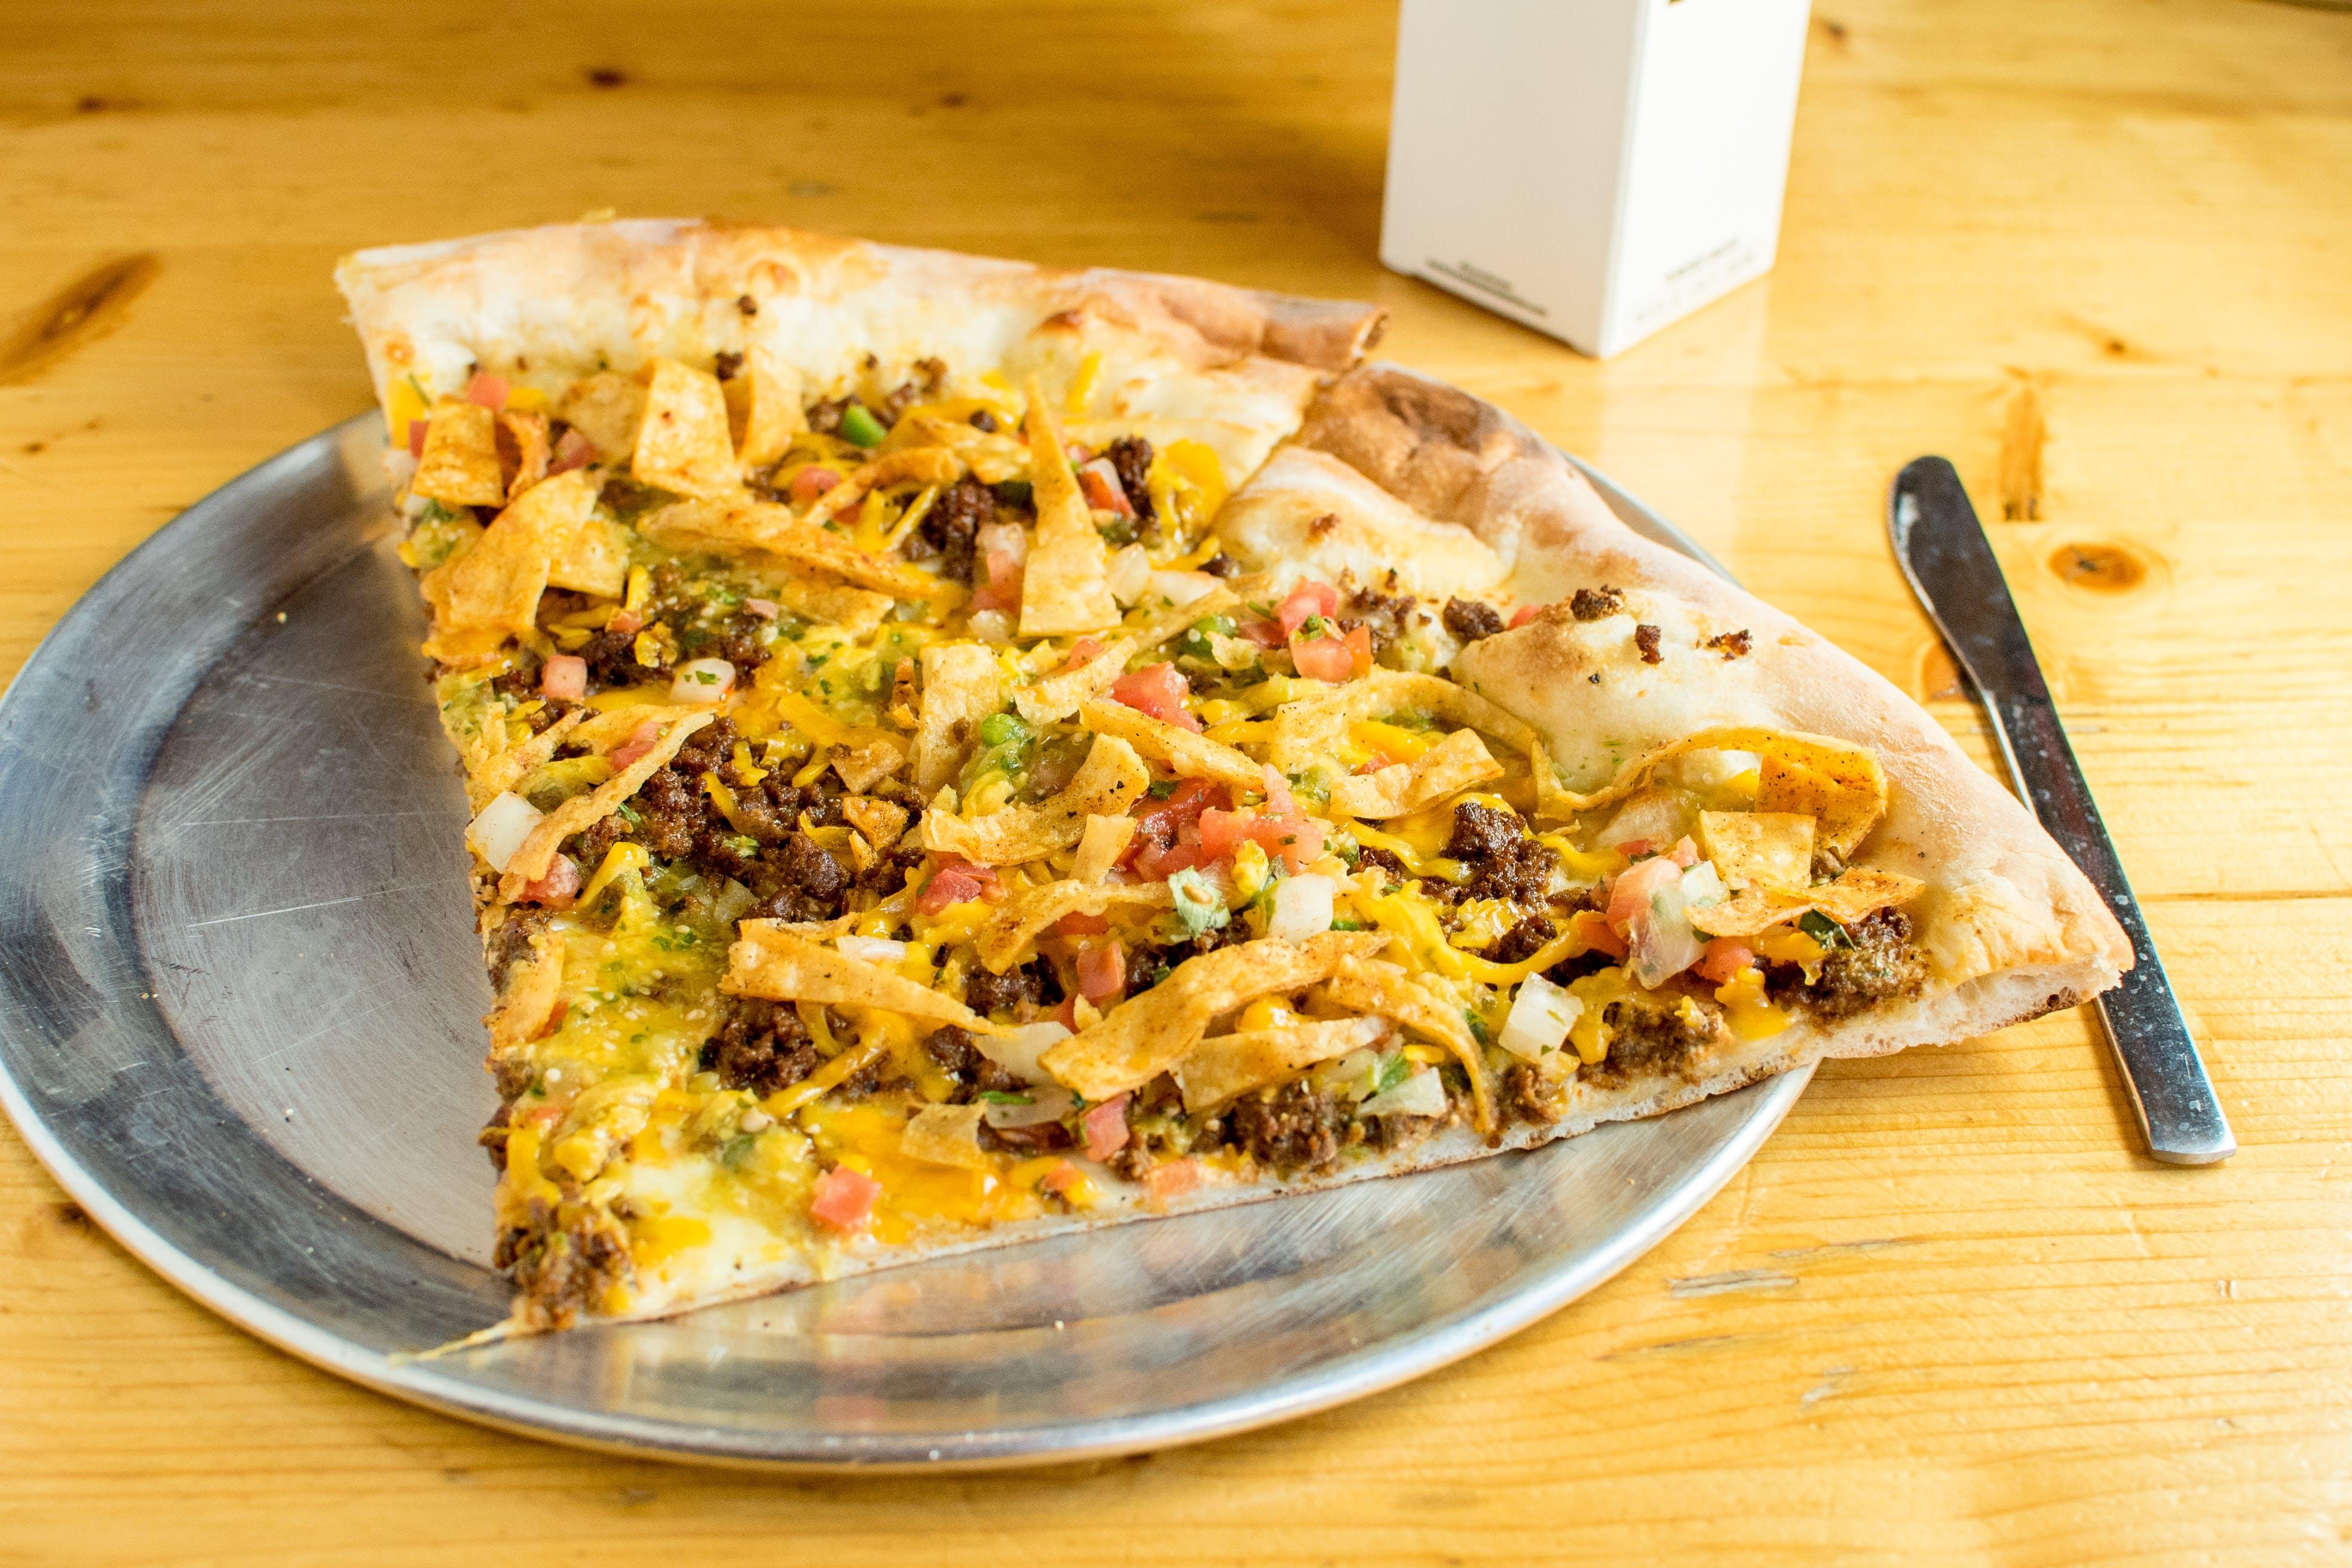 Macho Nacho from Ian's Pizza - Eastside in Milwaukee, WI